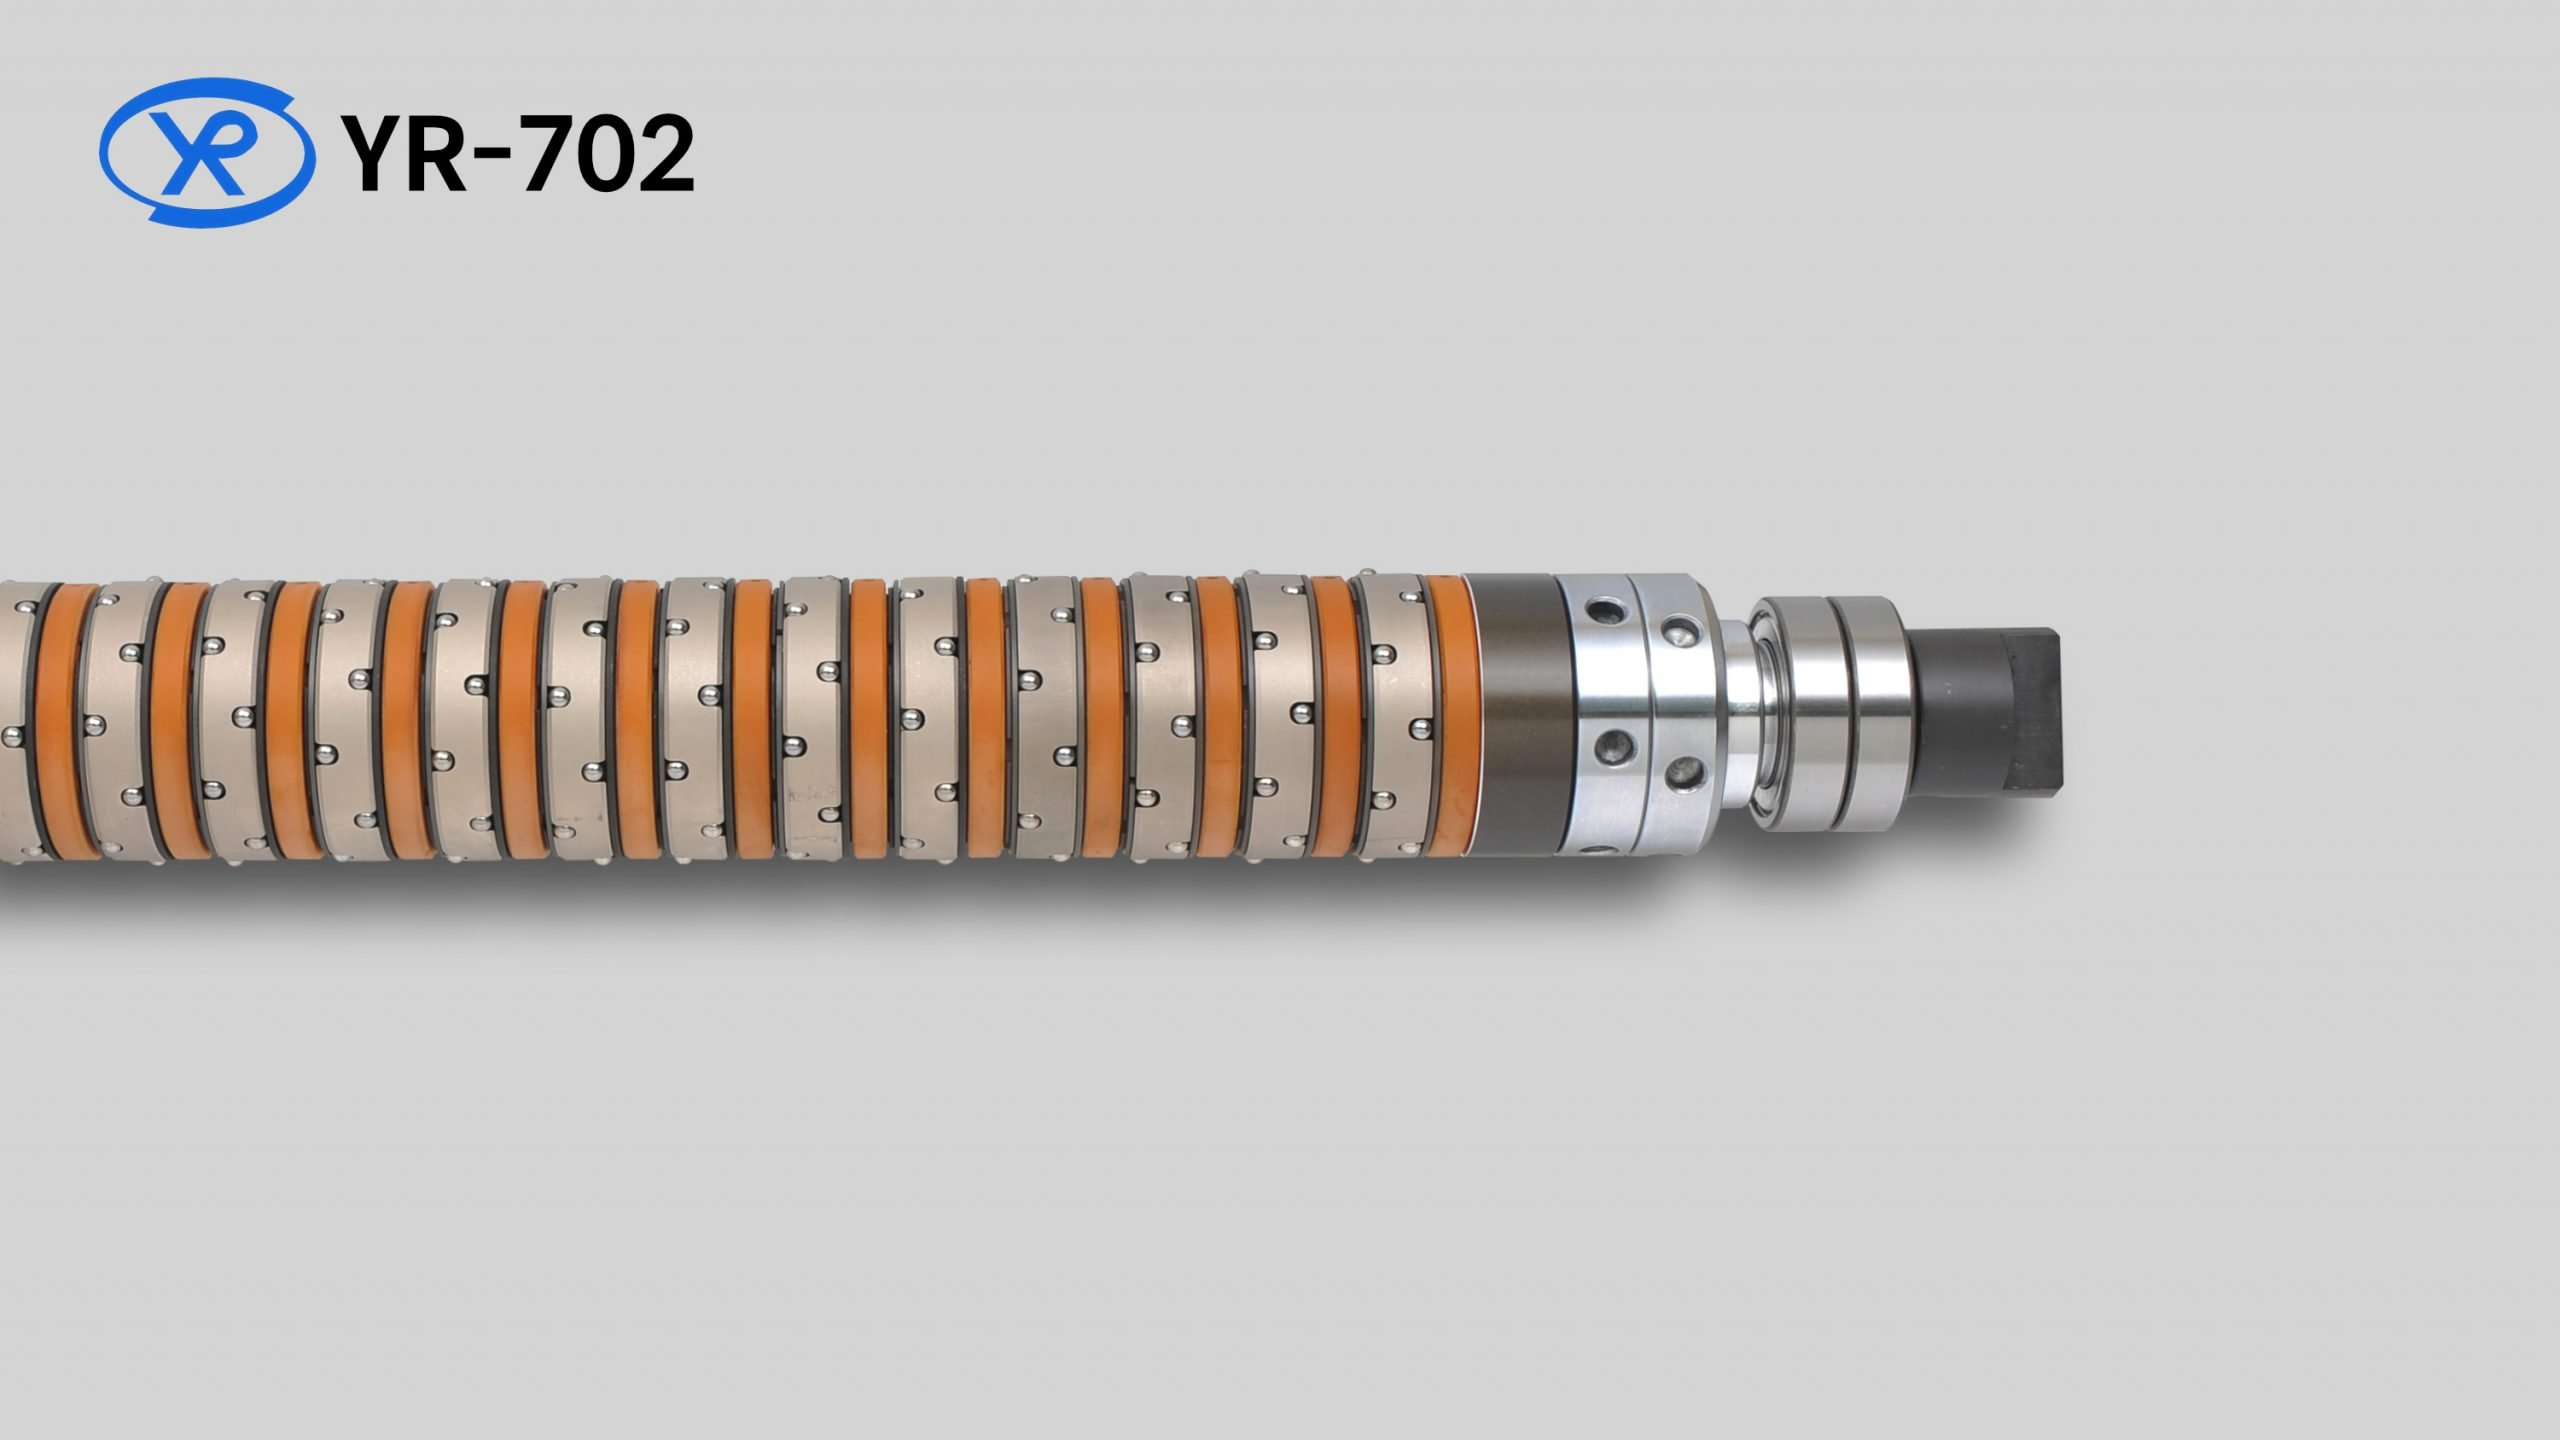 YR-702